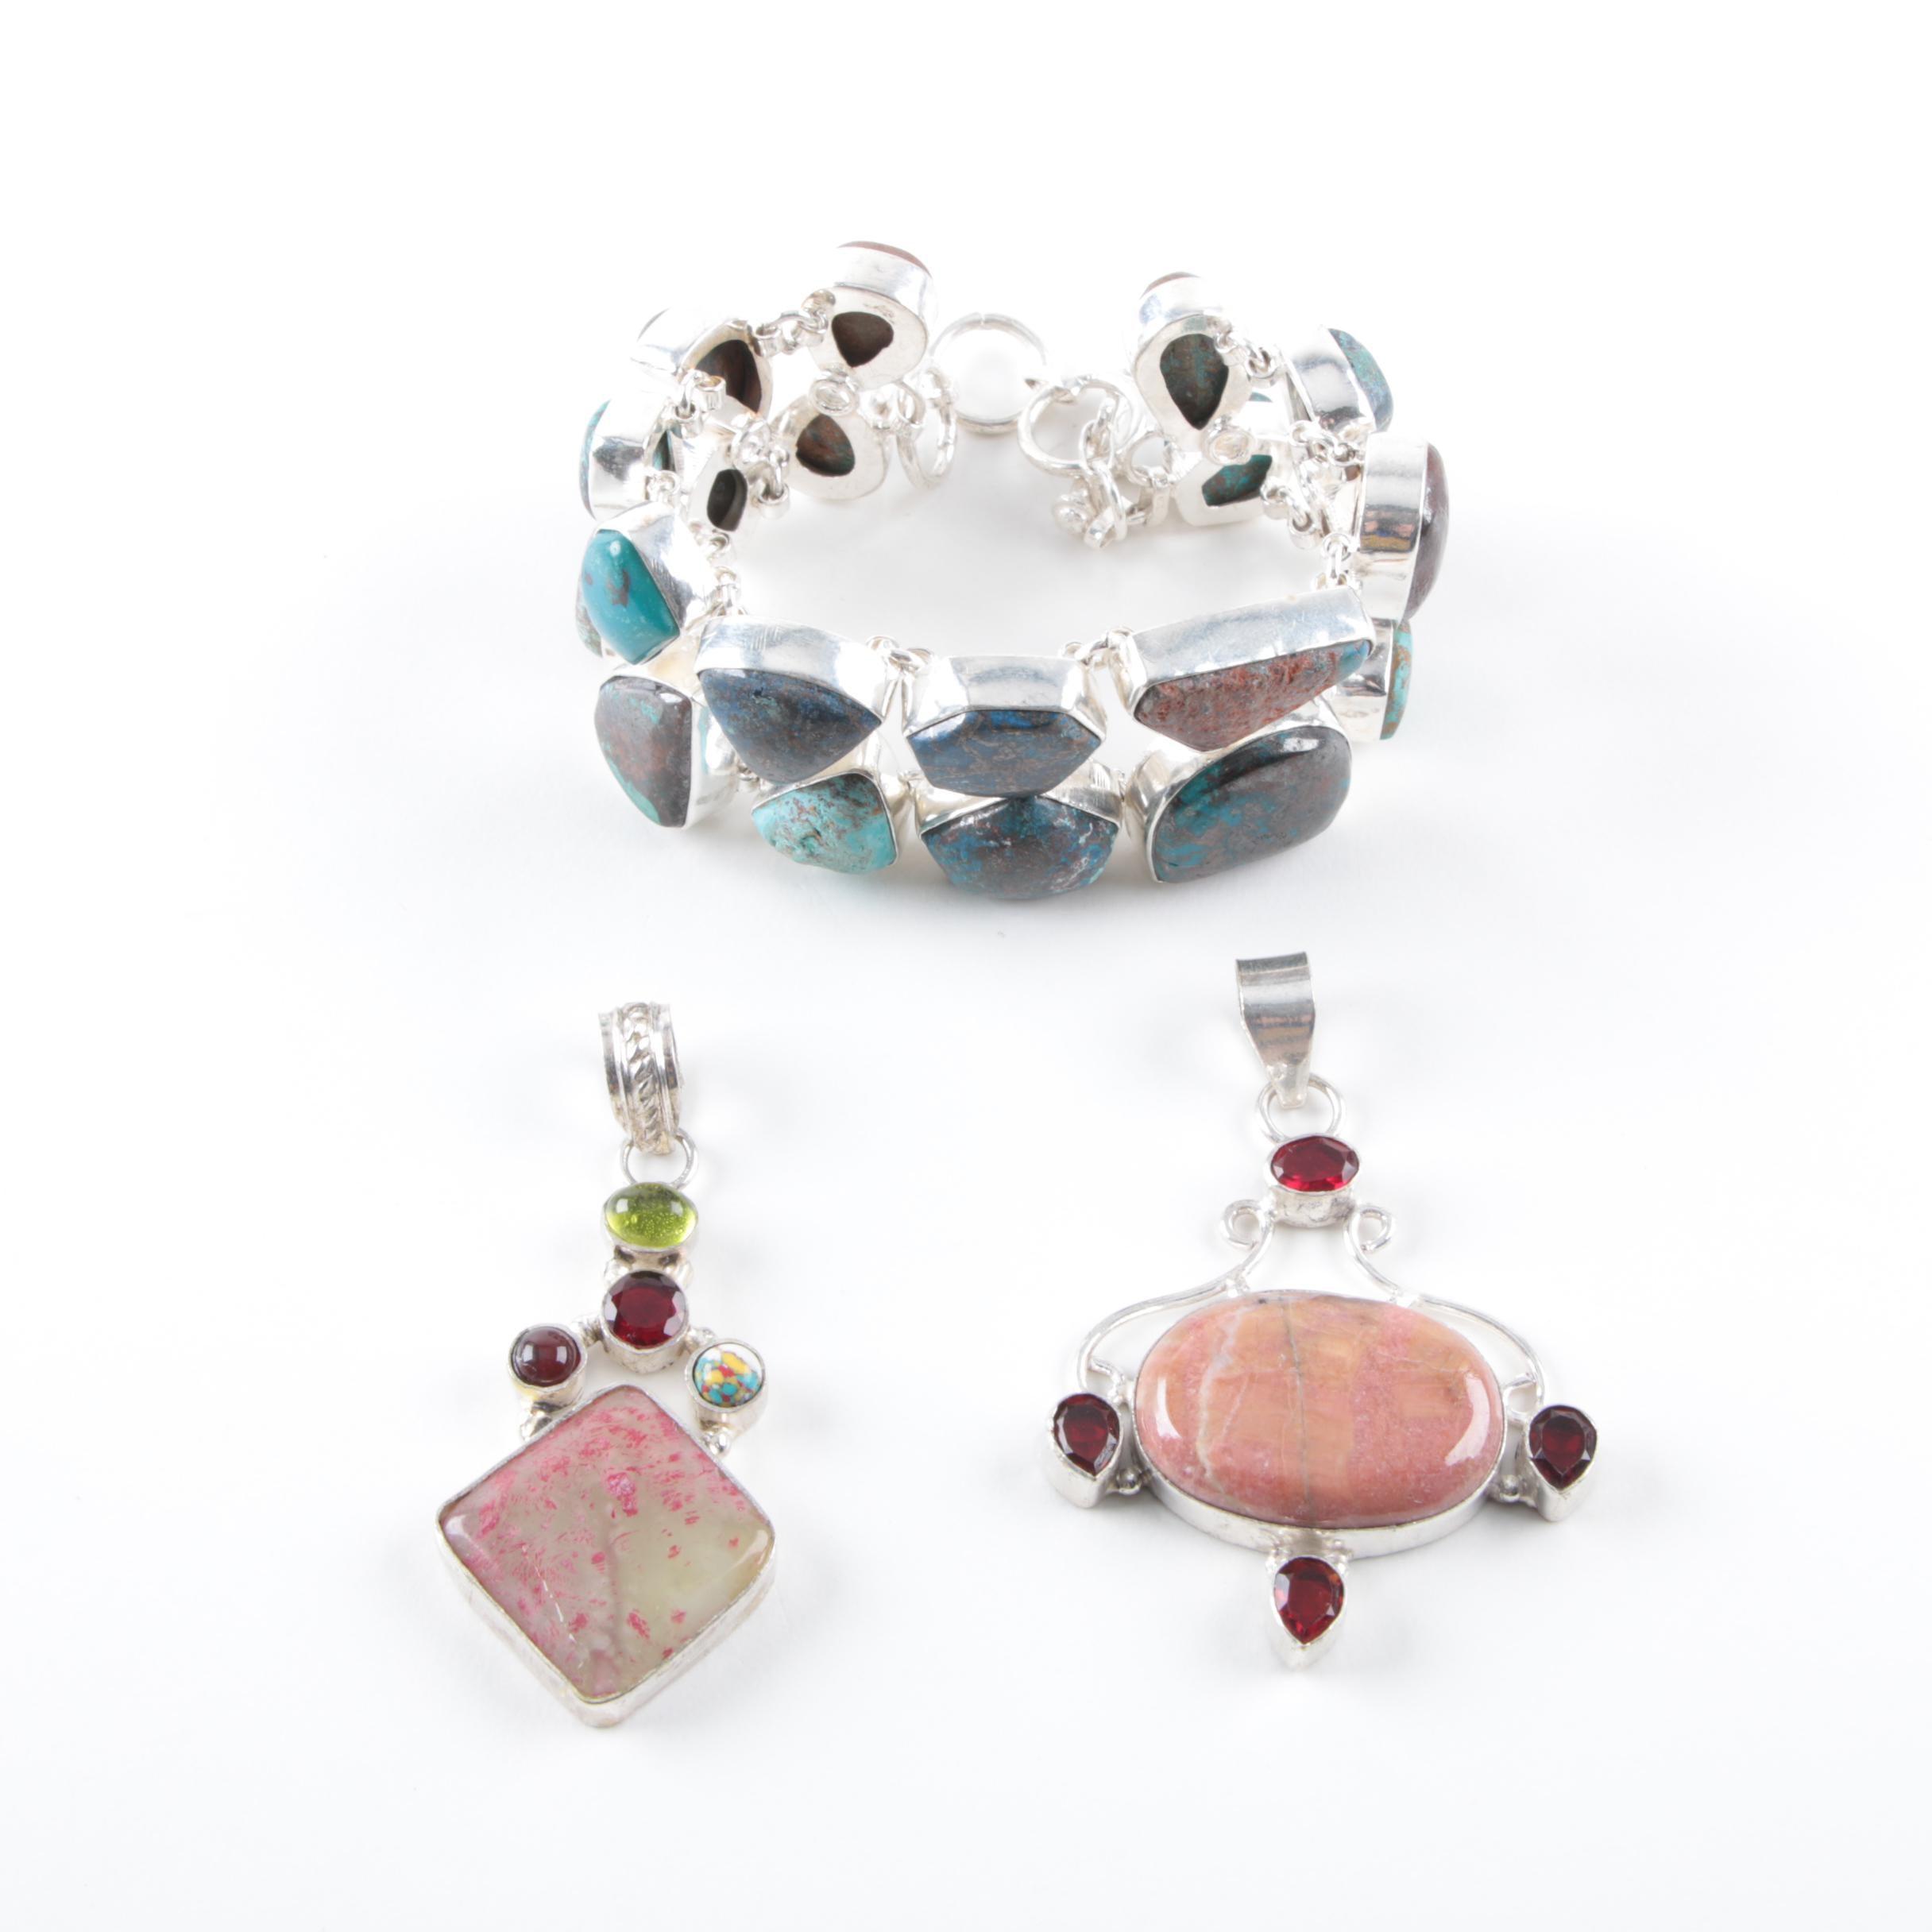 Sterling Silver Bracelet and Pendants